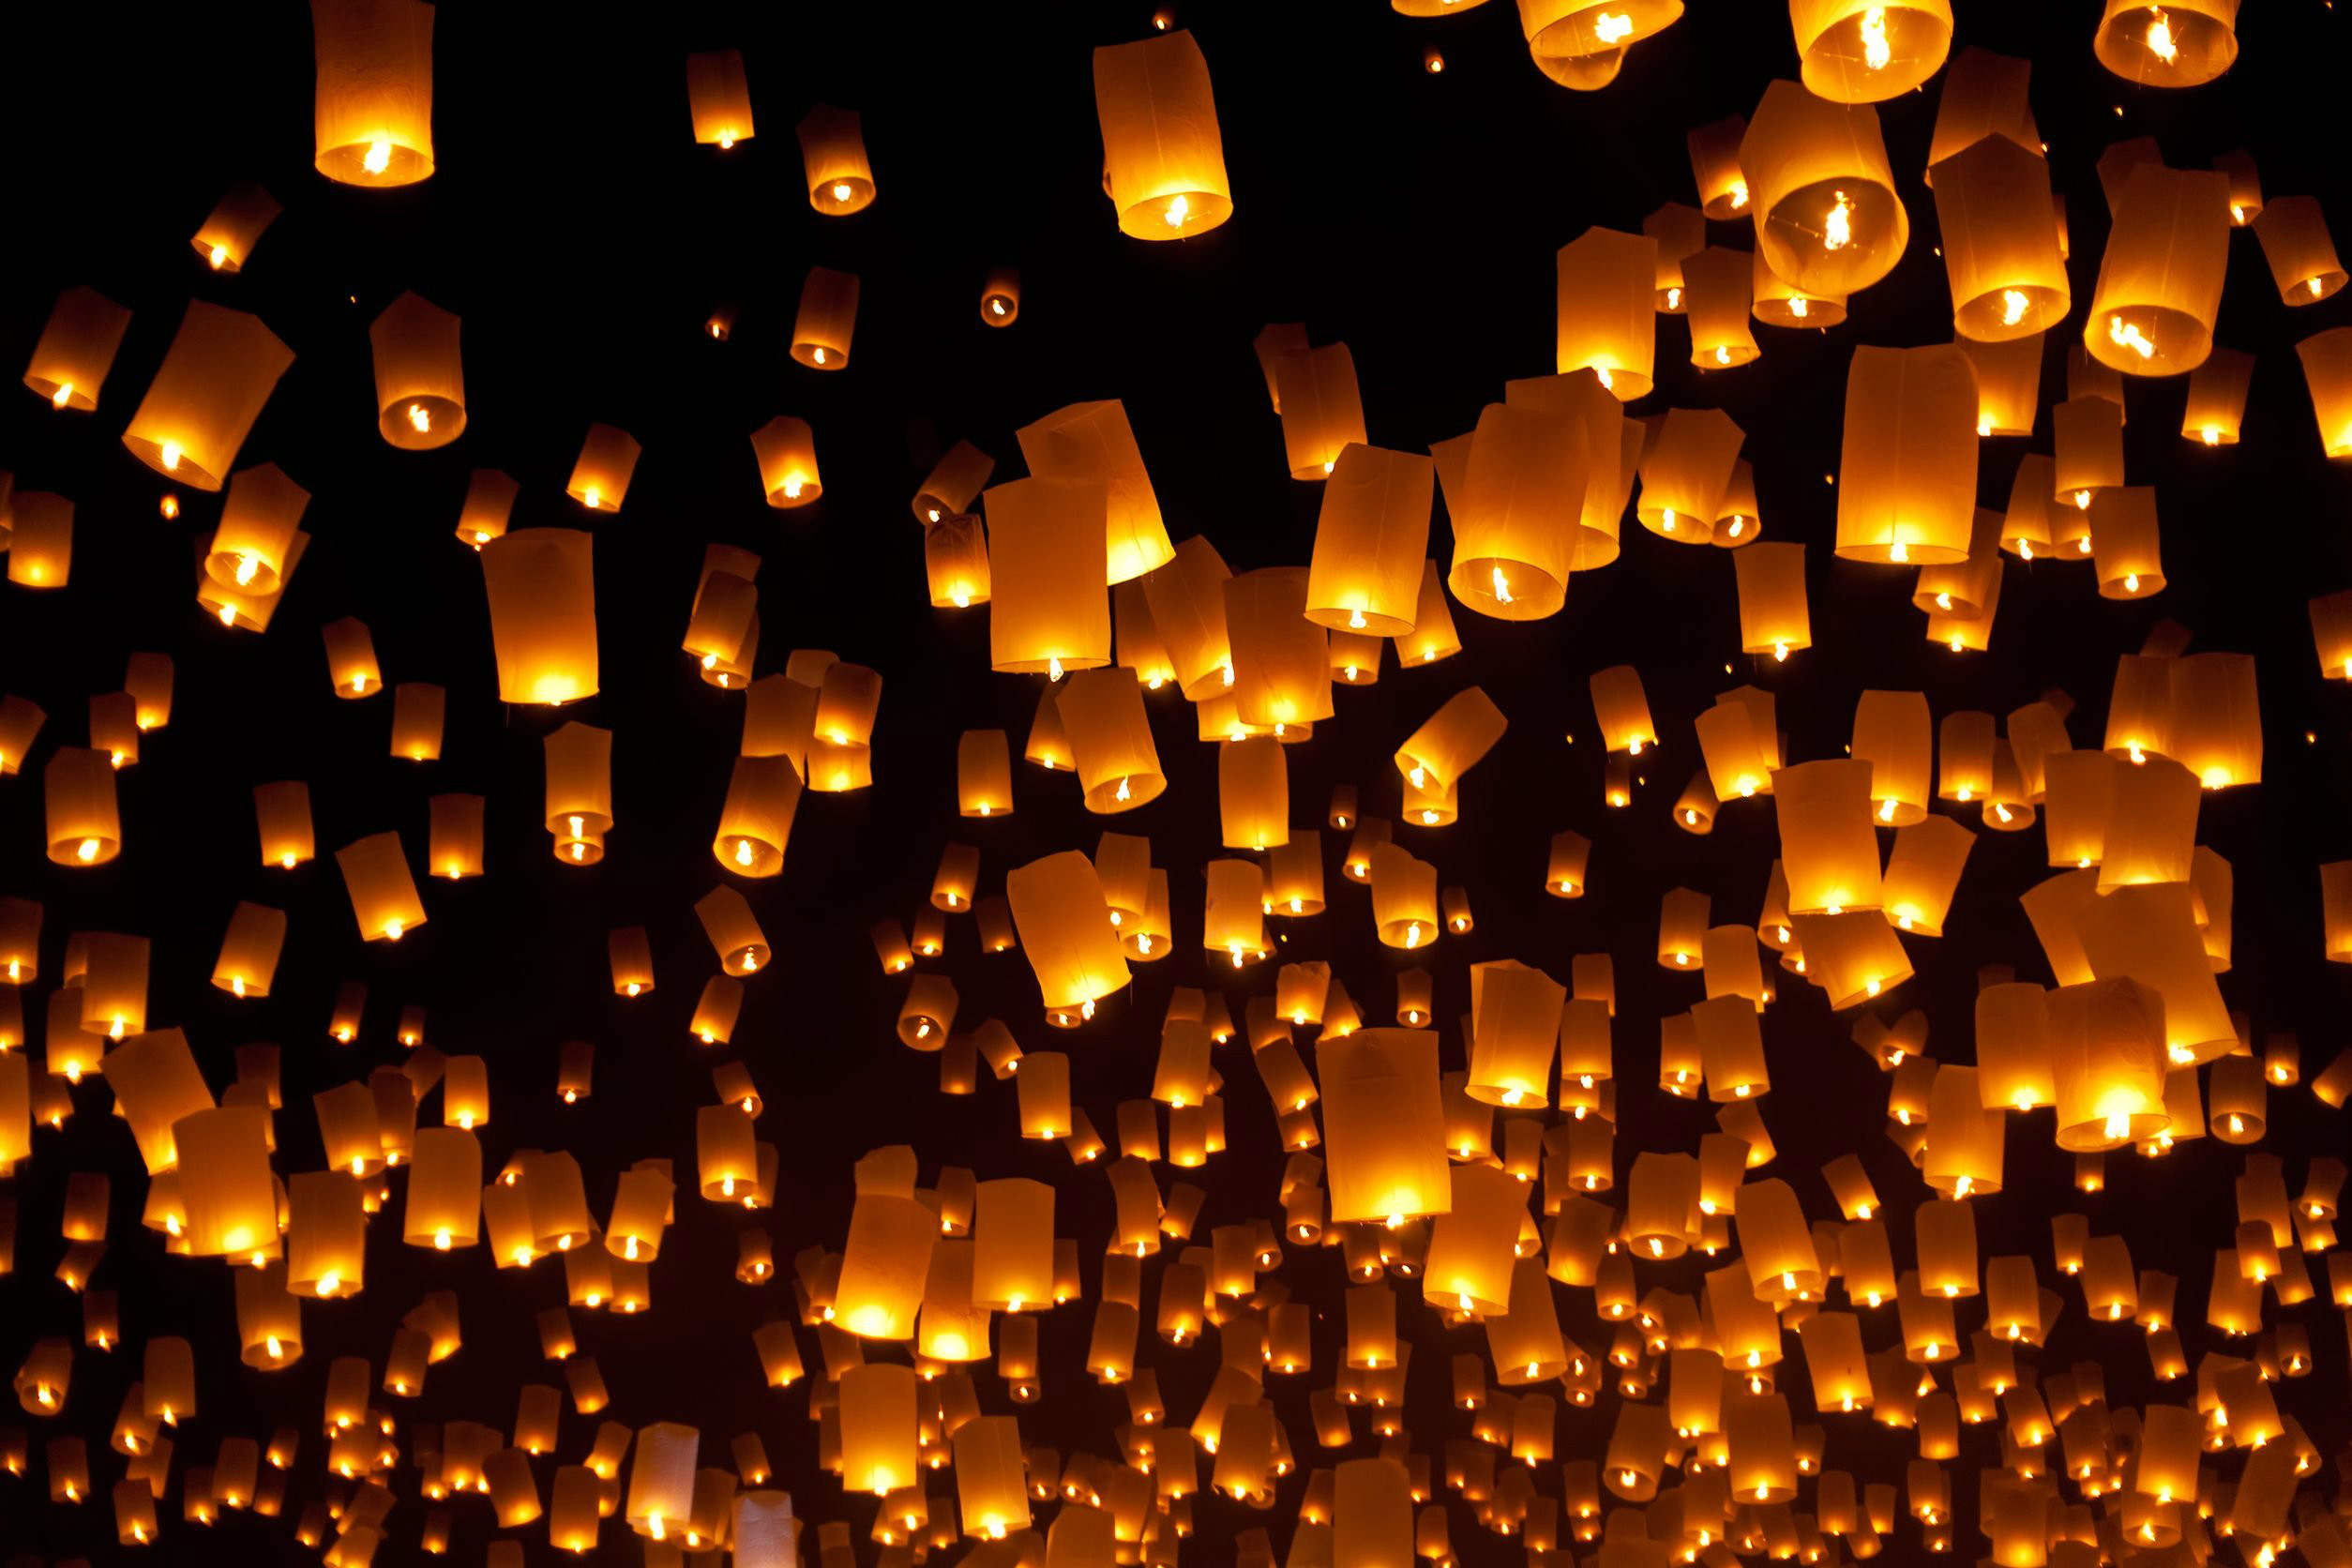 Res: 2508x1672, Sky Lantern festival, Thailand